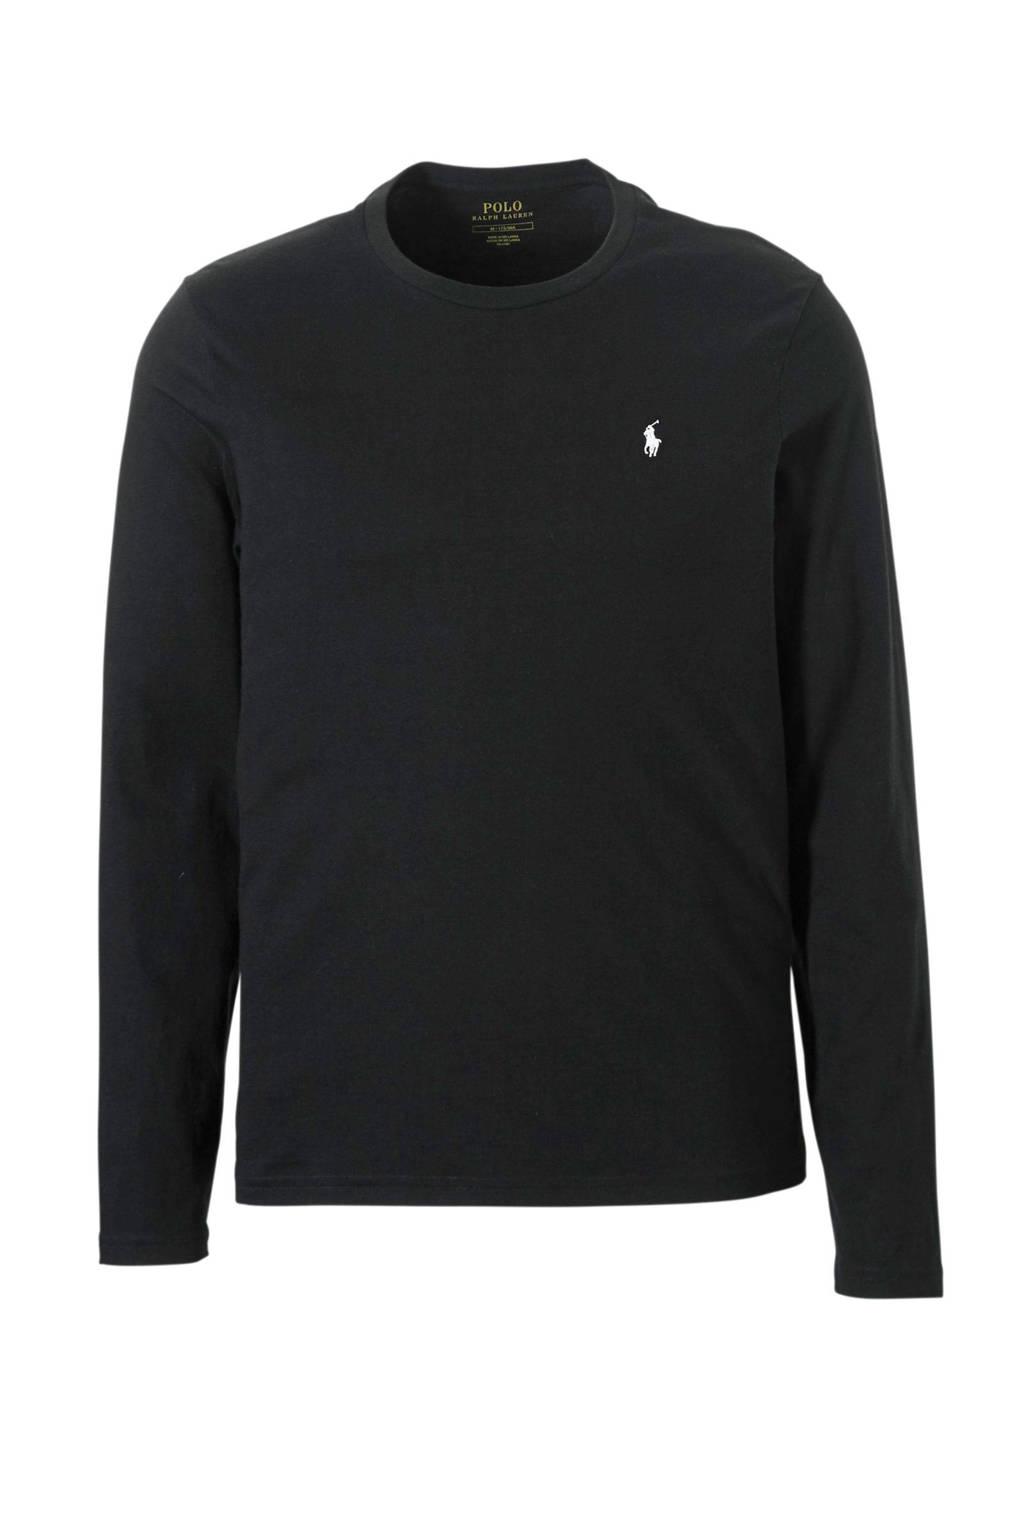 POLO Ralph Lauren pyjamatop zwart, Zwart